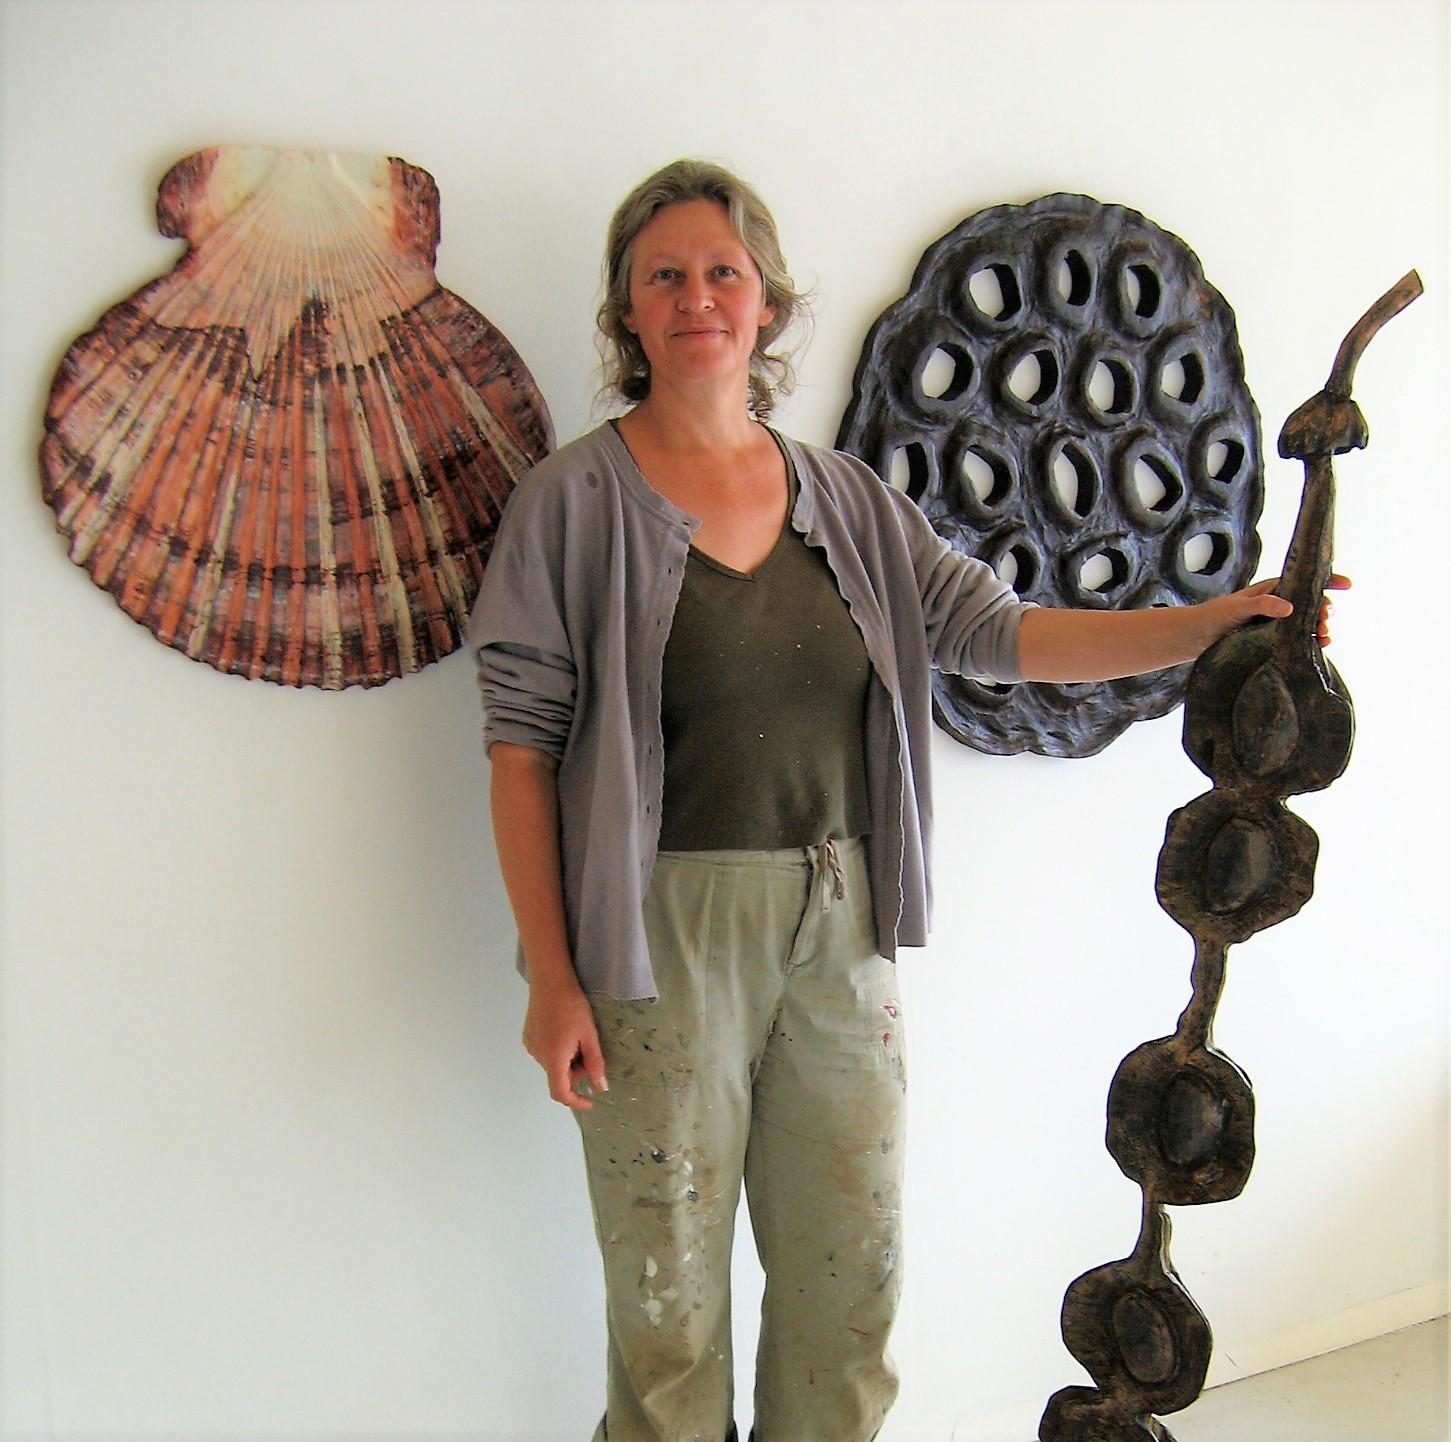 Liz McAuliffe